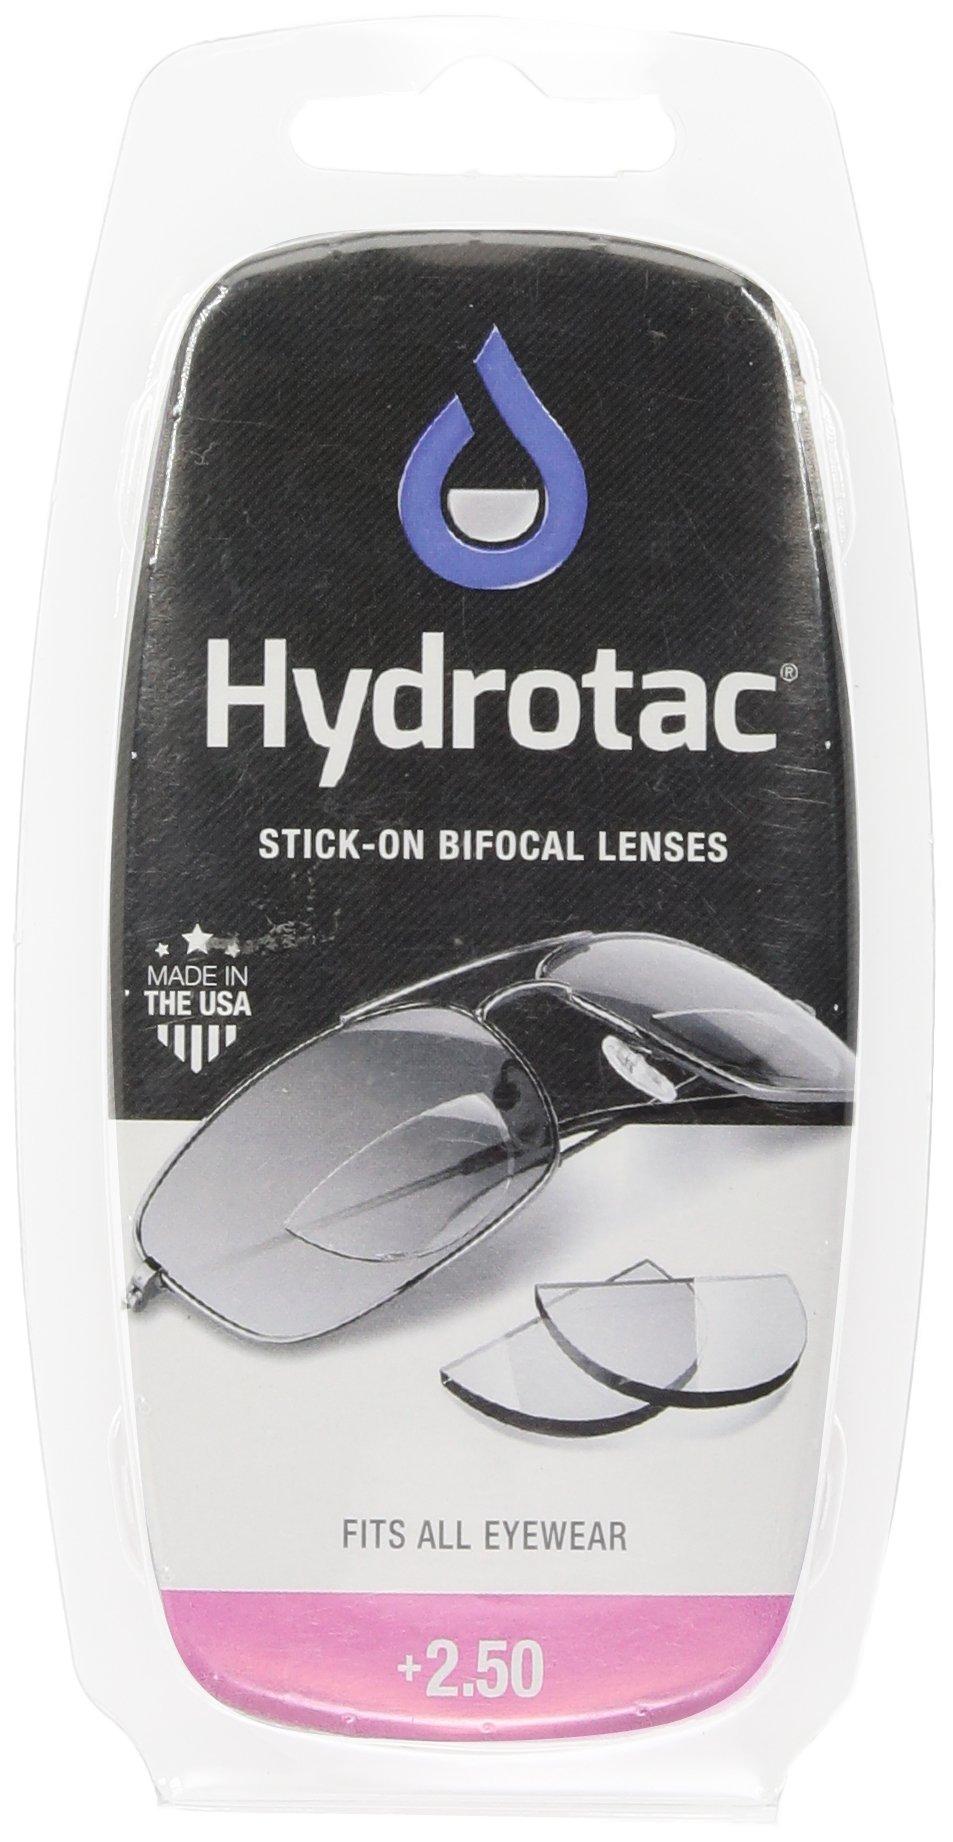 Neoptx Hydrotac Stick-On Bifocal Lenses